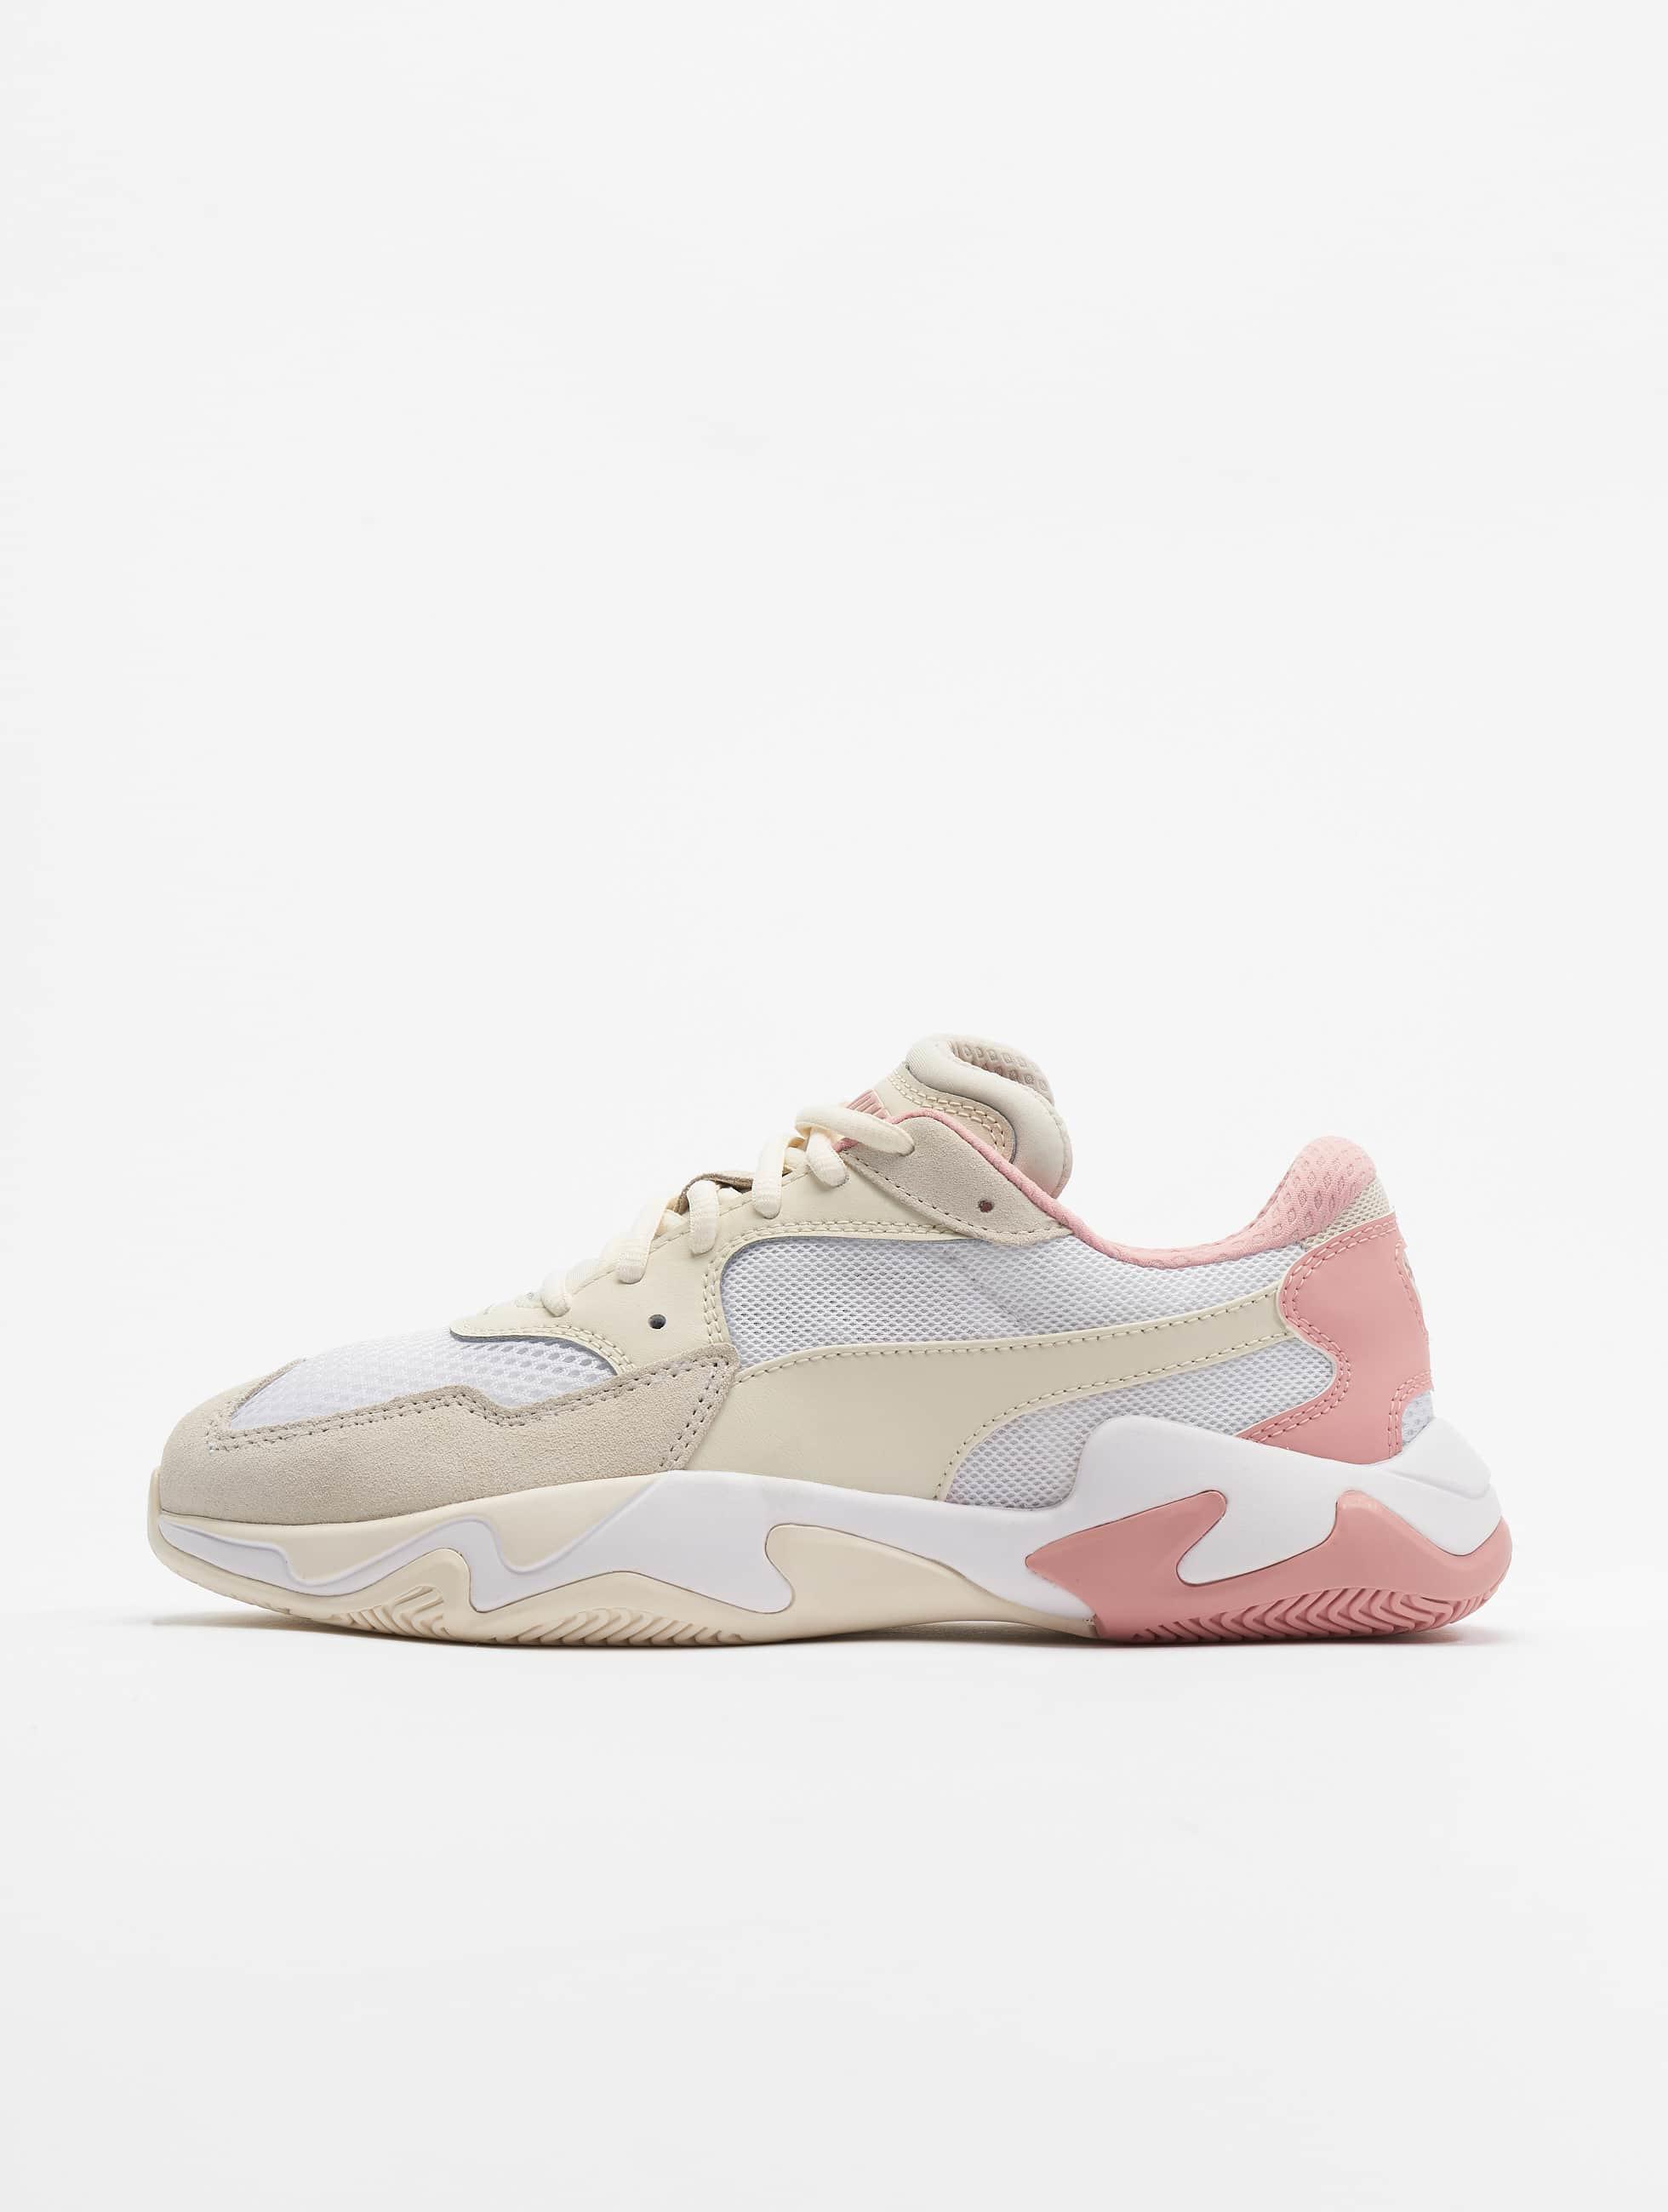 Puma Damen Sneaker Storm Origin in rosa 687332